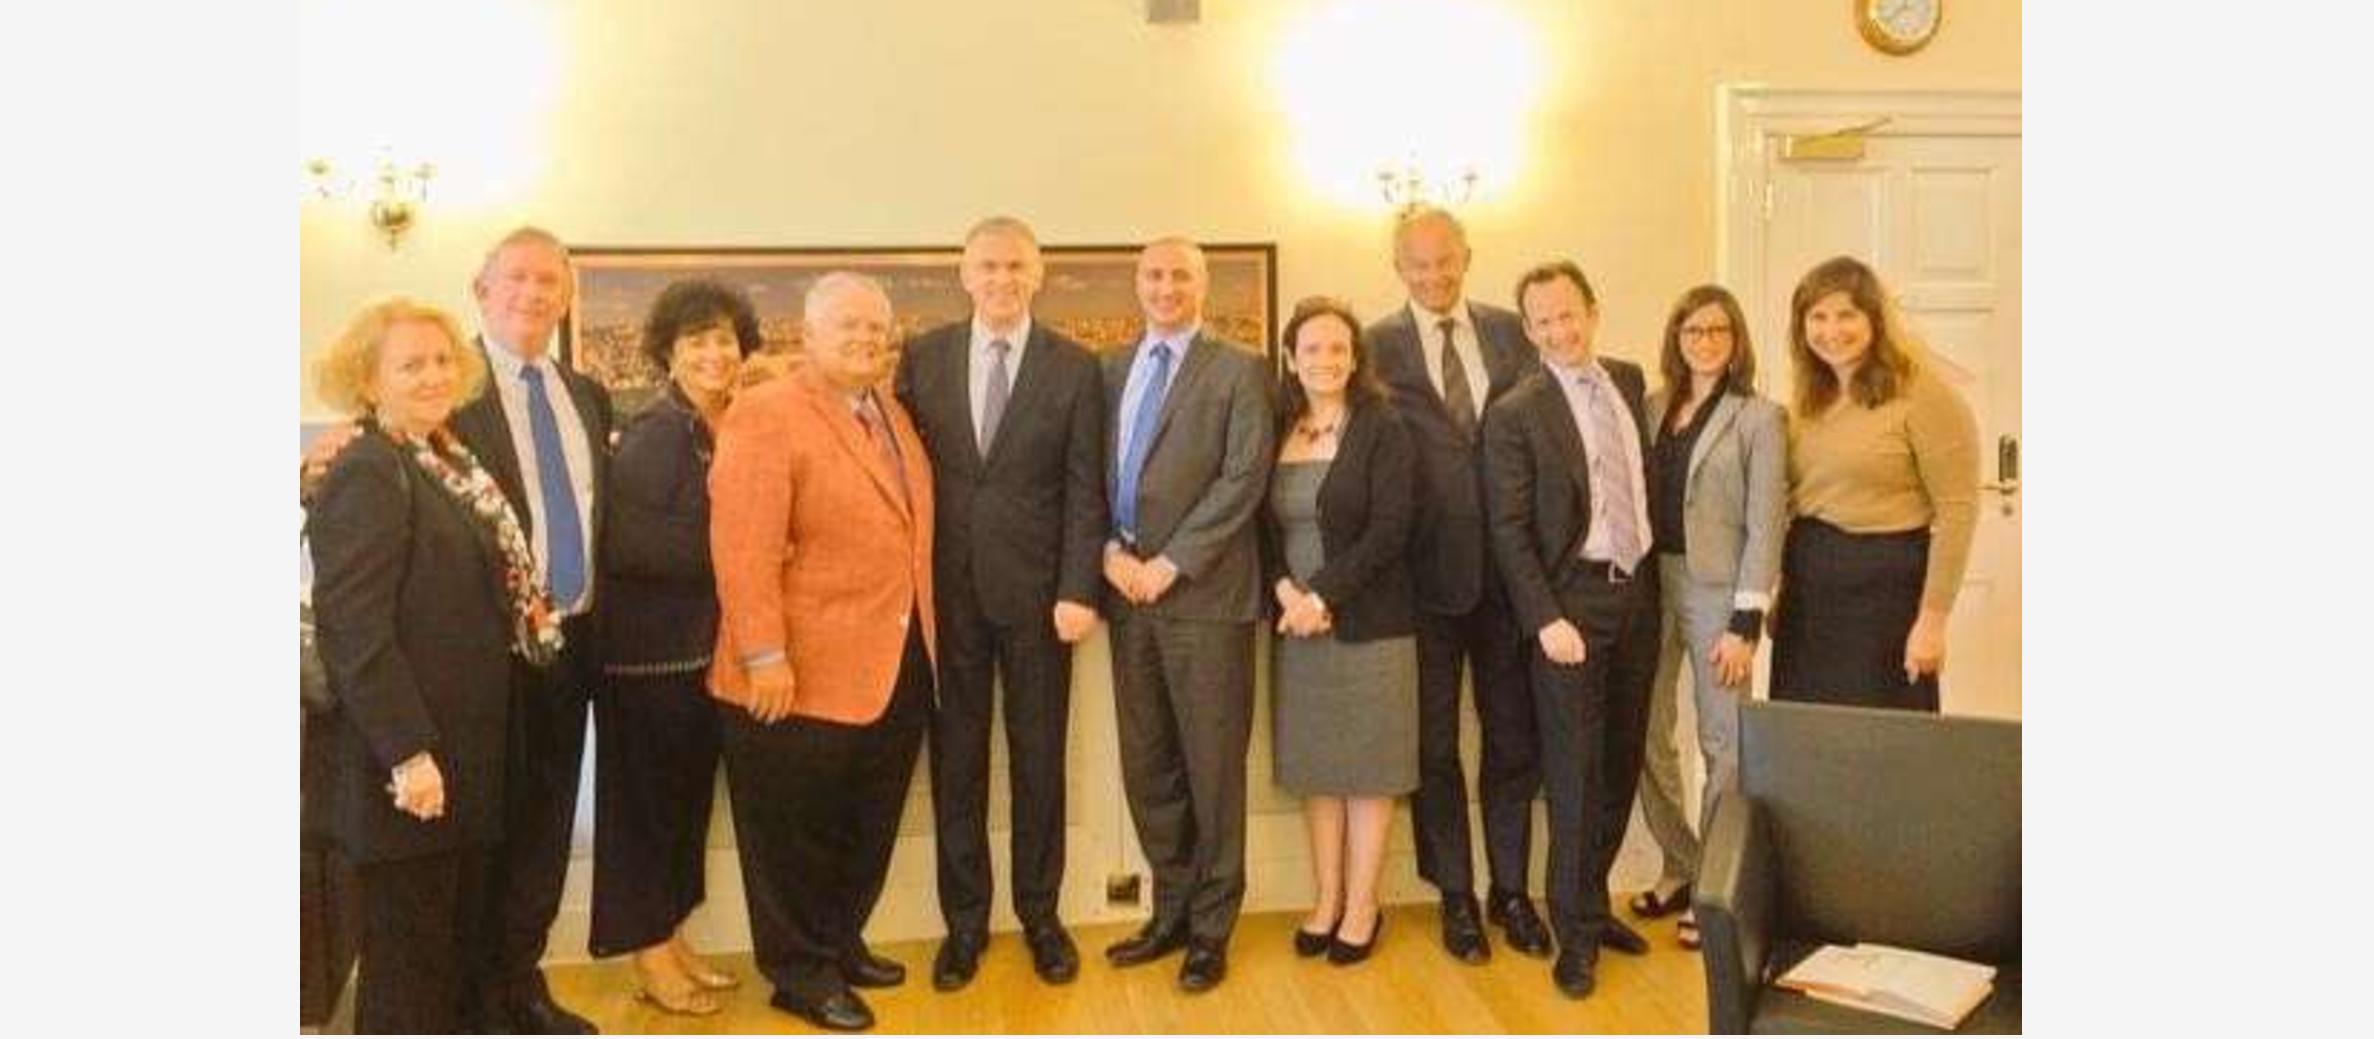 Ambassador Taub welcomes CUFI UK